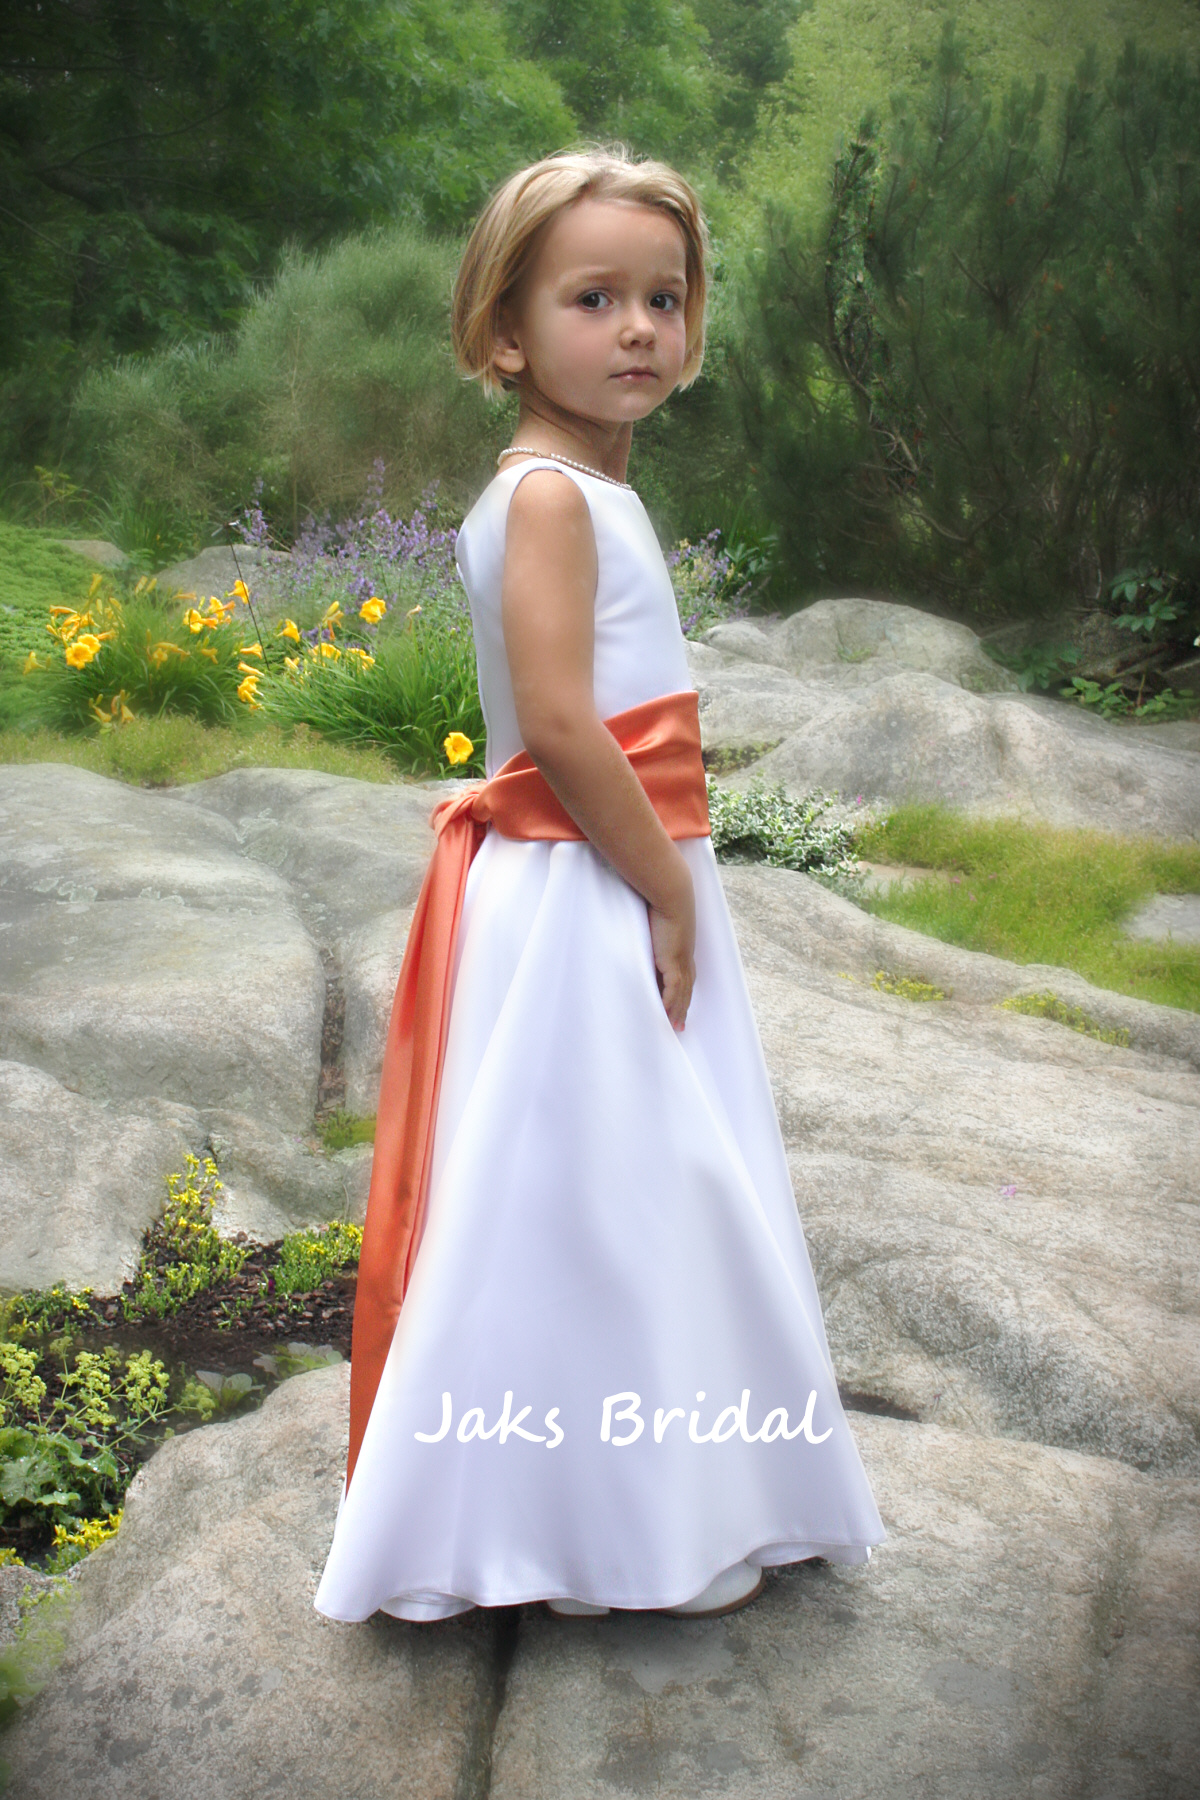 White munion dress with colorful sash